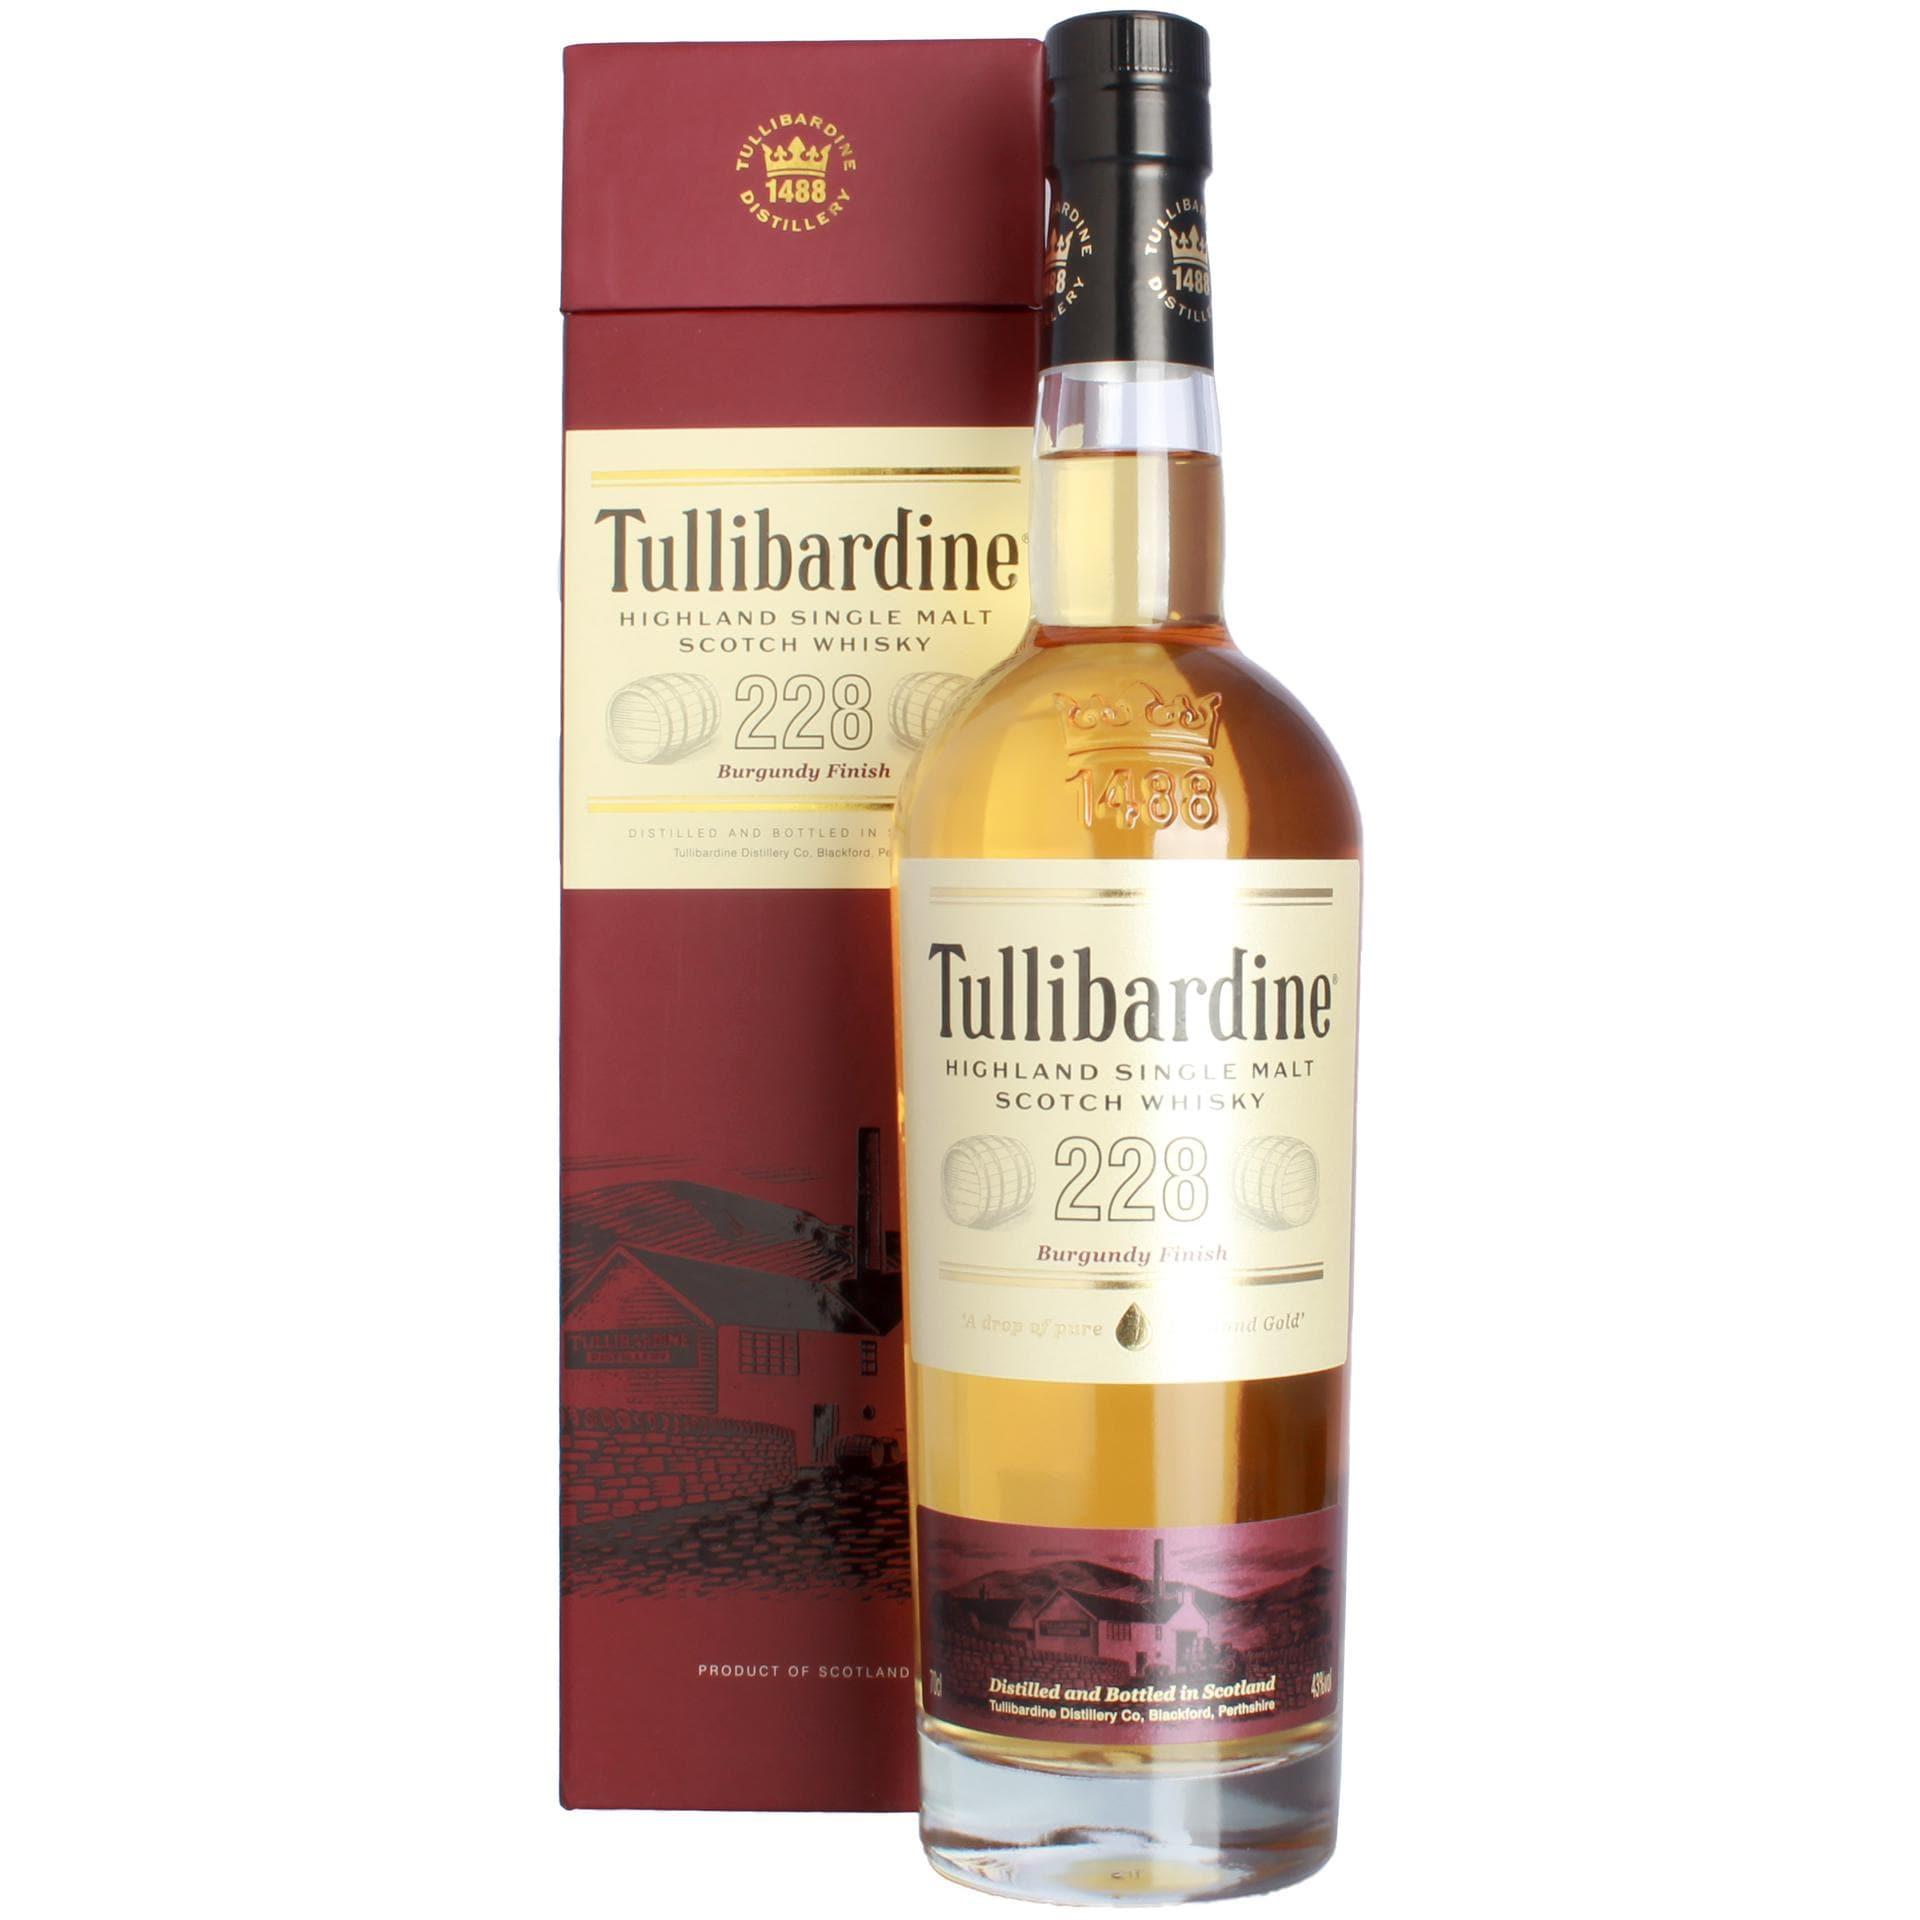 Tullibardine 228 Burgundy Finish Scotch Whisky 0,7l